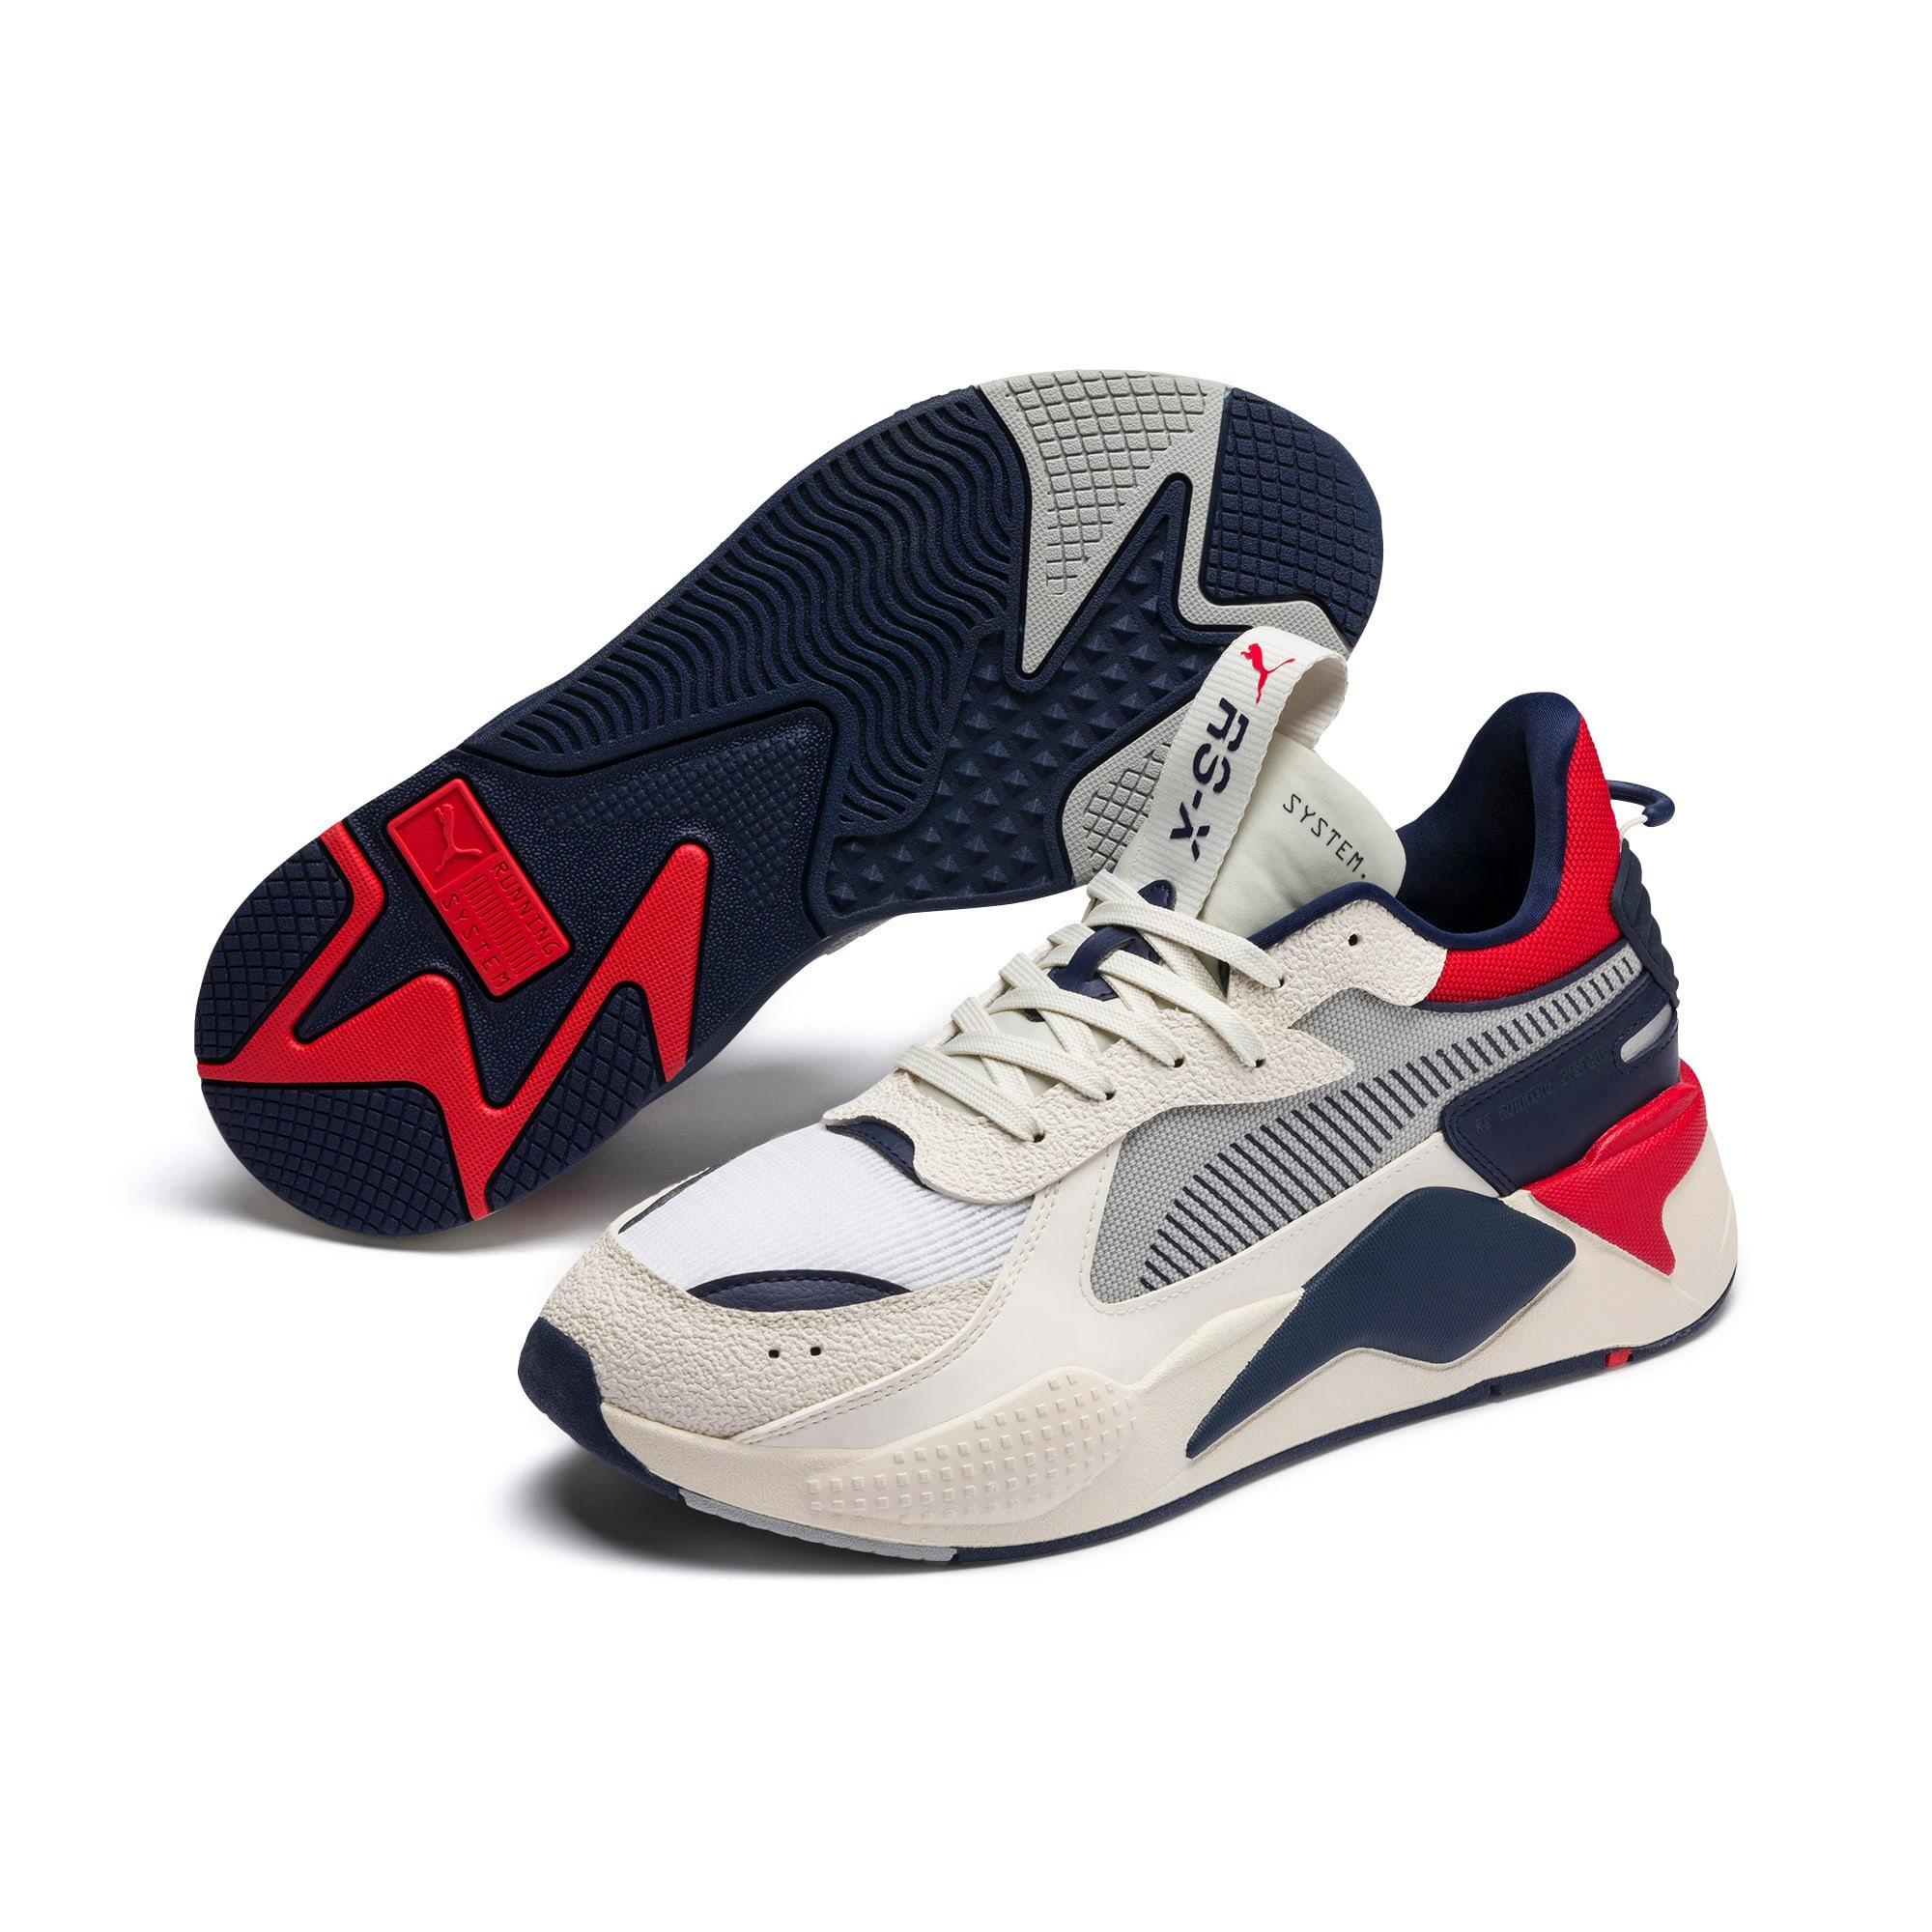 Thumbnail 3 of RS-X Hard Drive Sneaker, Whisper White-Peacoat, medium